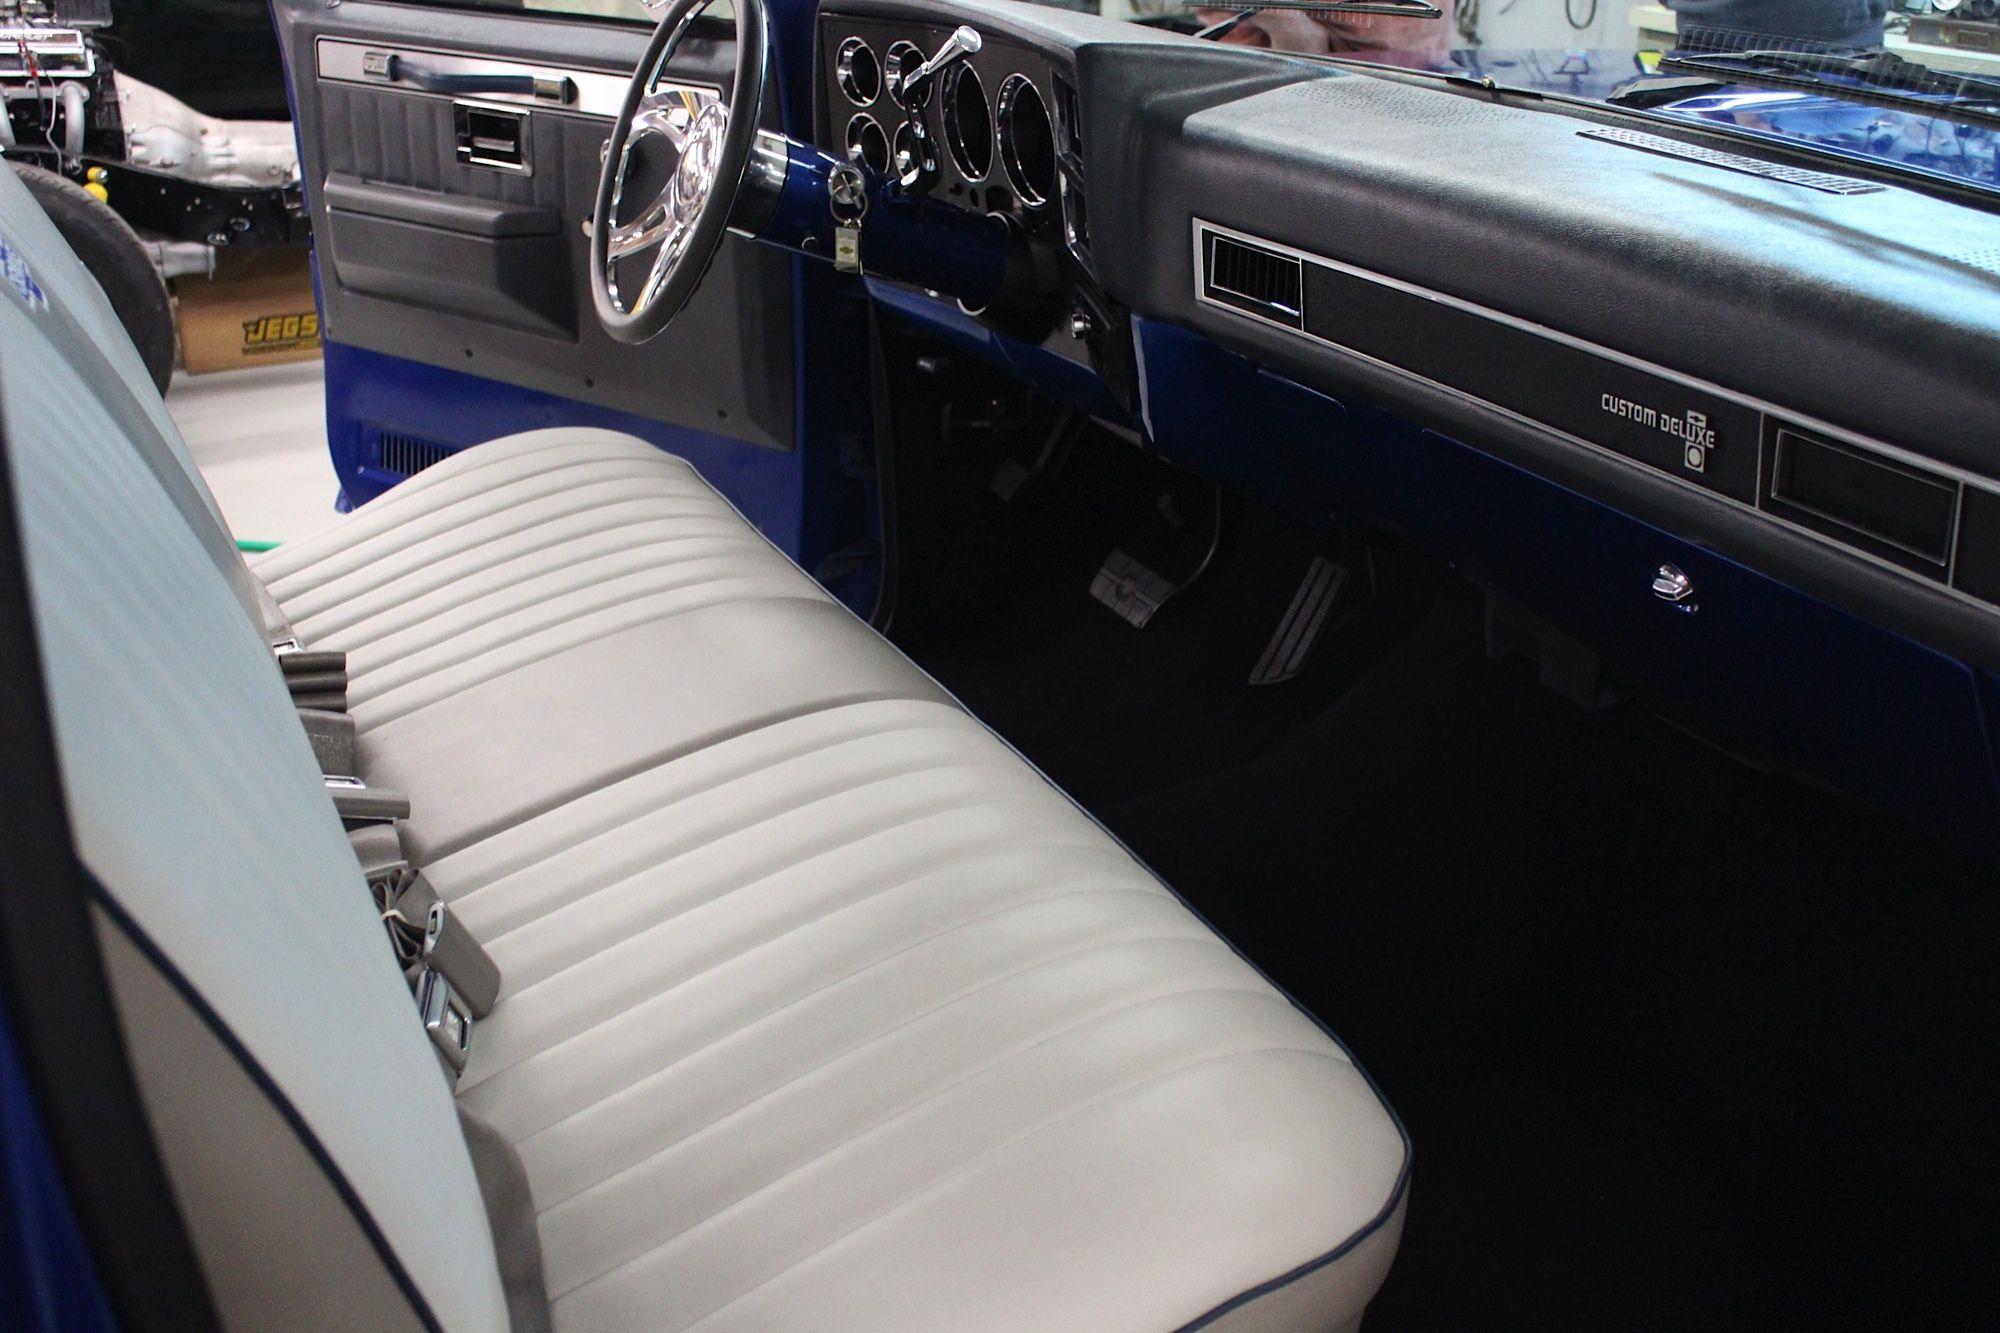 Truck Interiors Truck Interior 1987 Chevy Silverado C10 Chevy Truck